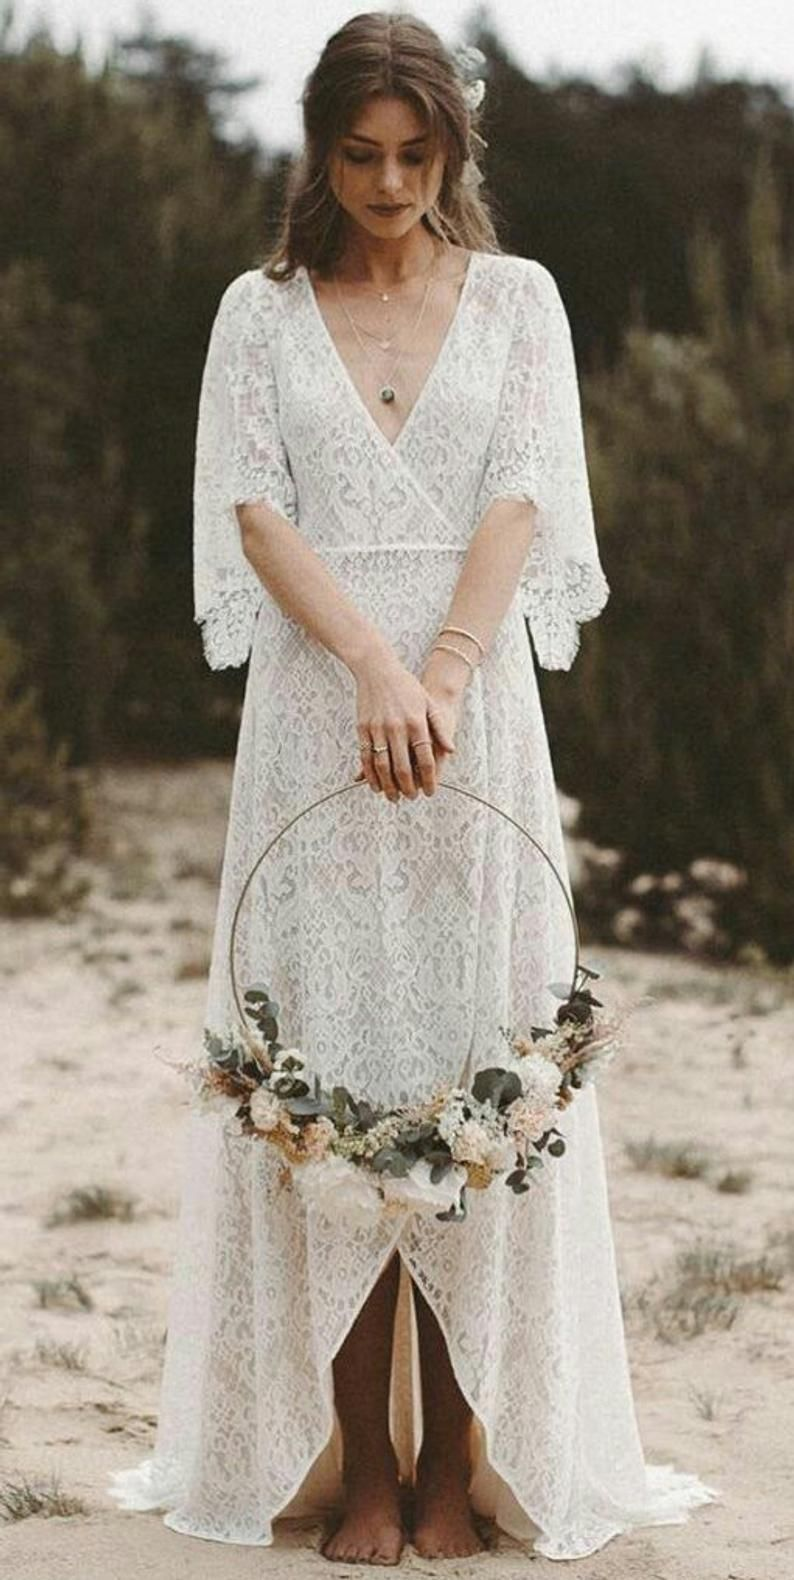 Boho Wedding Dress Vintage Wedding Dress Boho Lace Dress Wedding Lace Dress Wedding Boho Lace Vintage Lace Dress Vintage Lace Dress In 2021 Vintage Wedding Dress Boho Lace Dress Vintage Empire [ 1580 x 794 Pixel ]